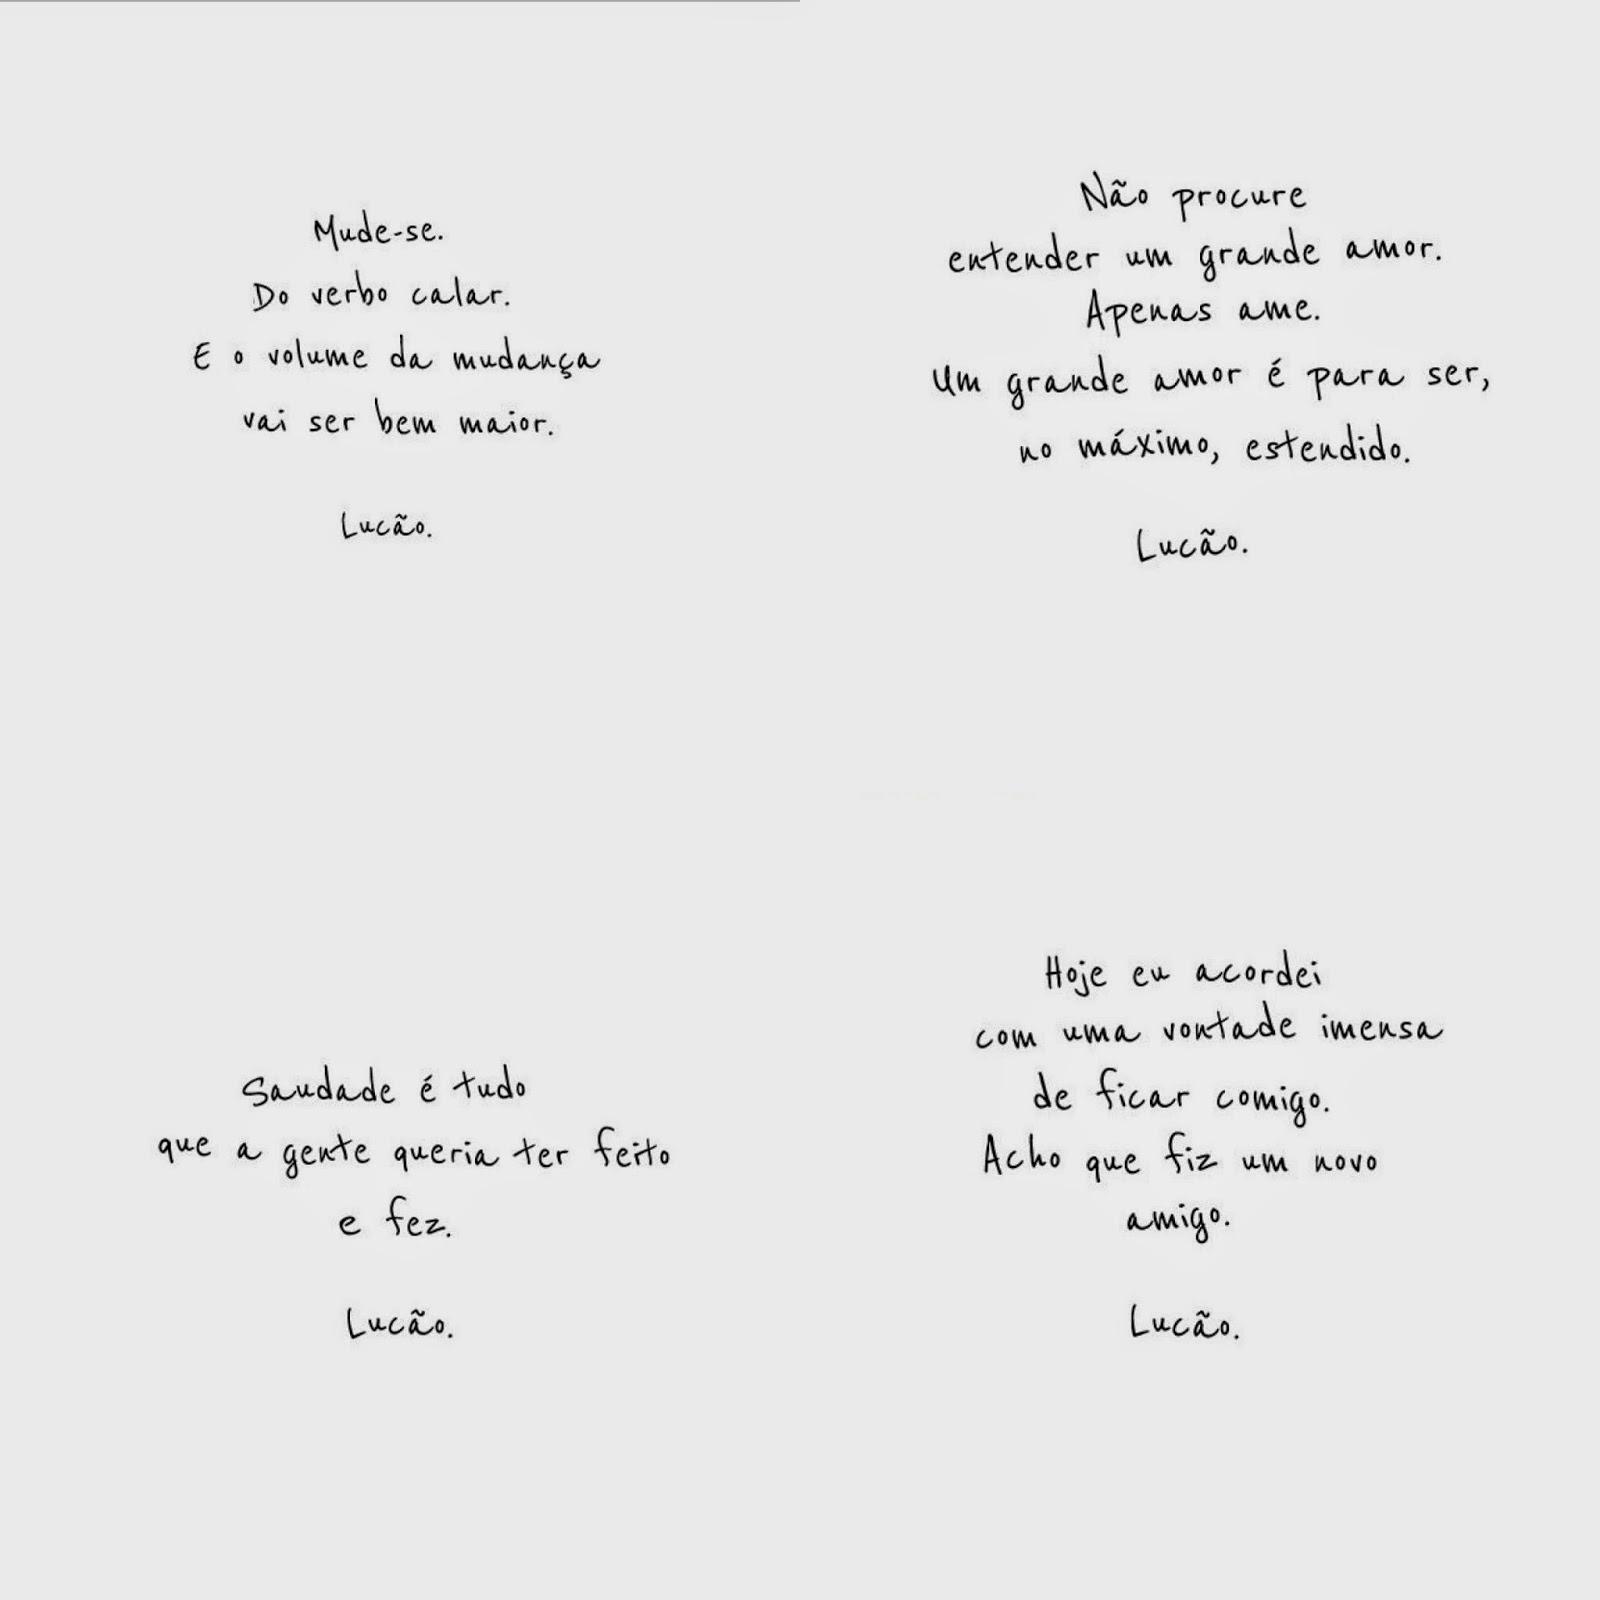 Frases Para Perfil Do Instagram